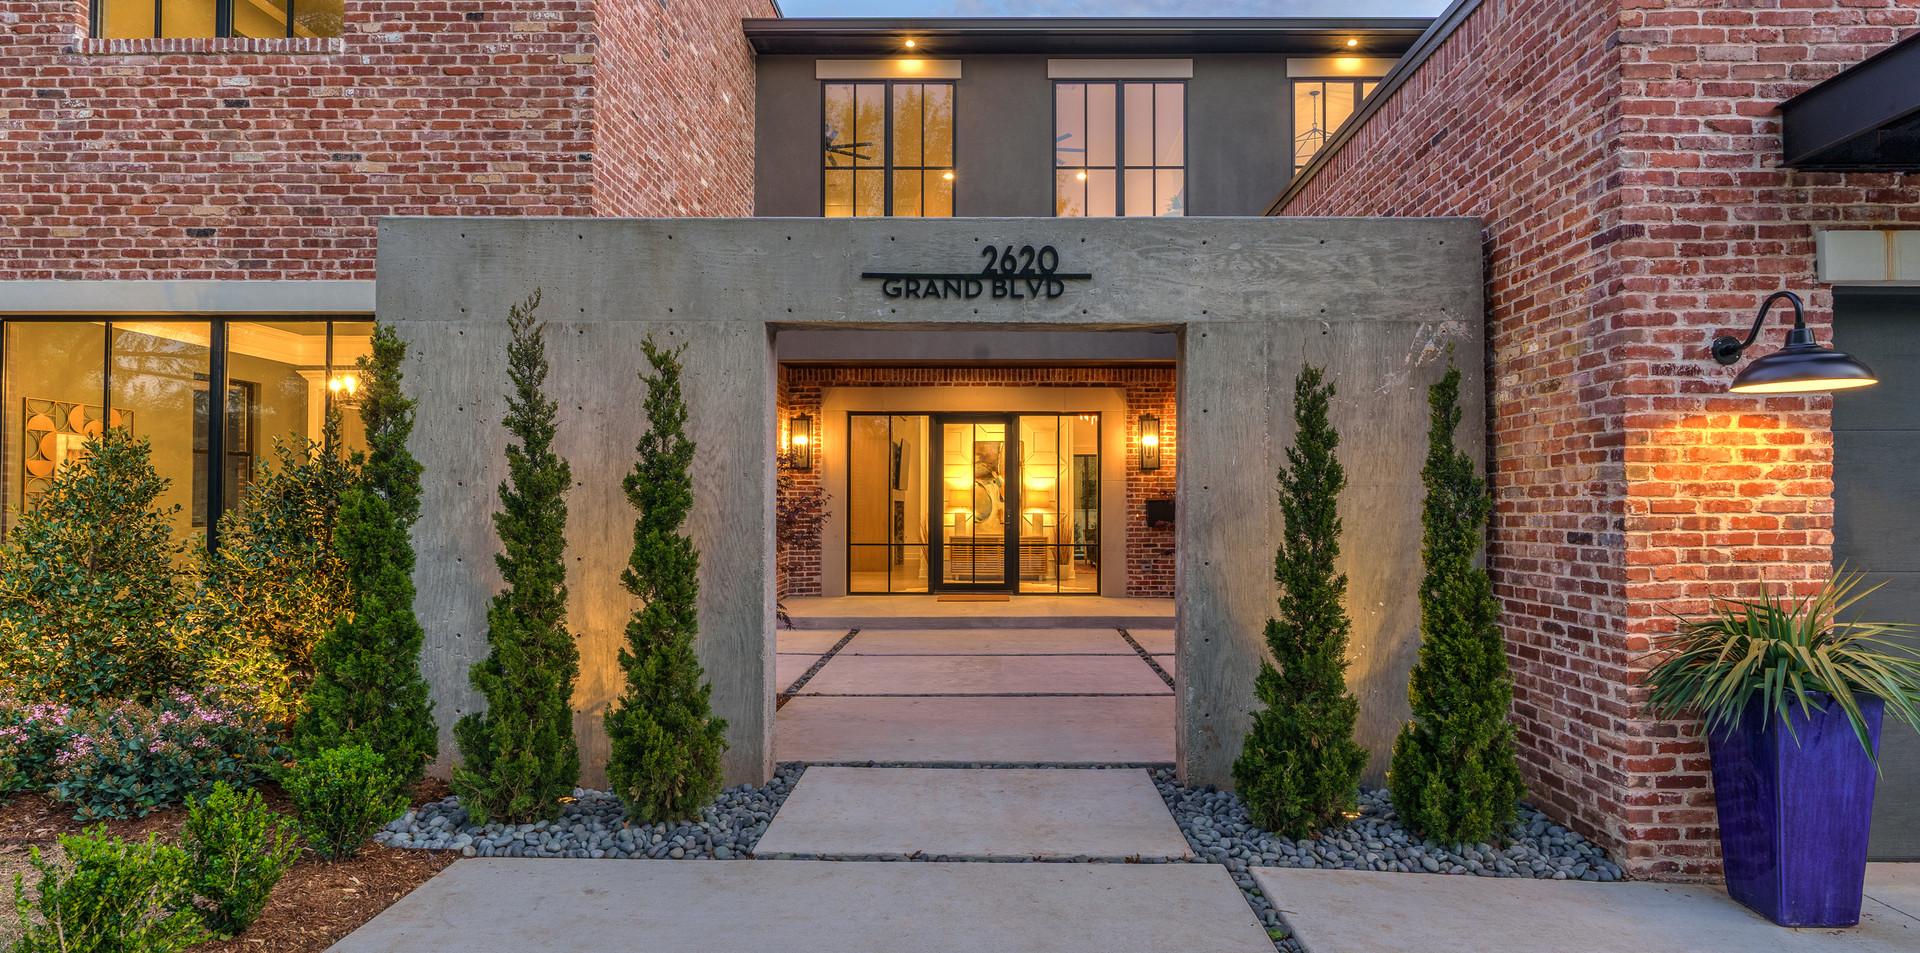 2620 NW Grand Blvd Courtyard